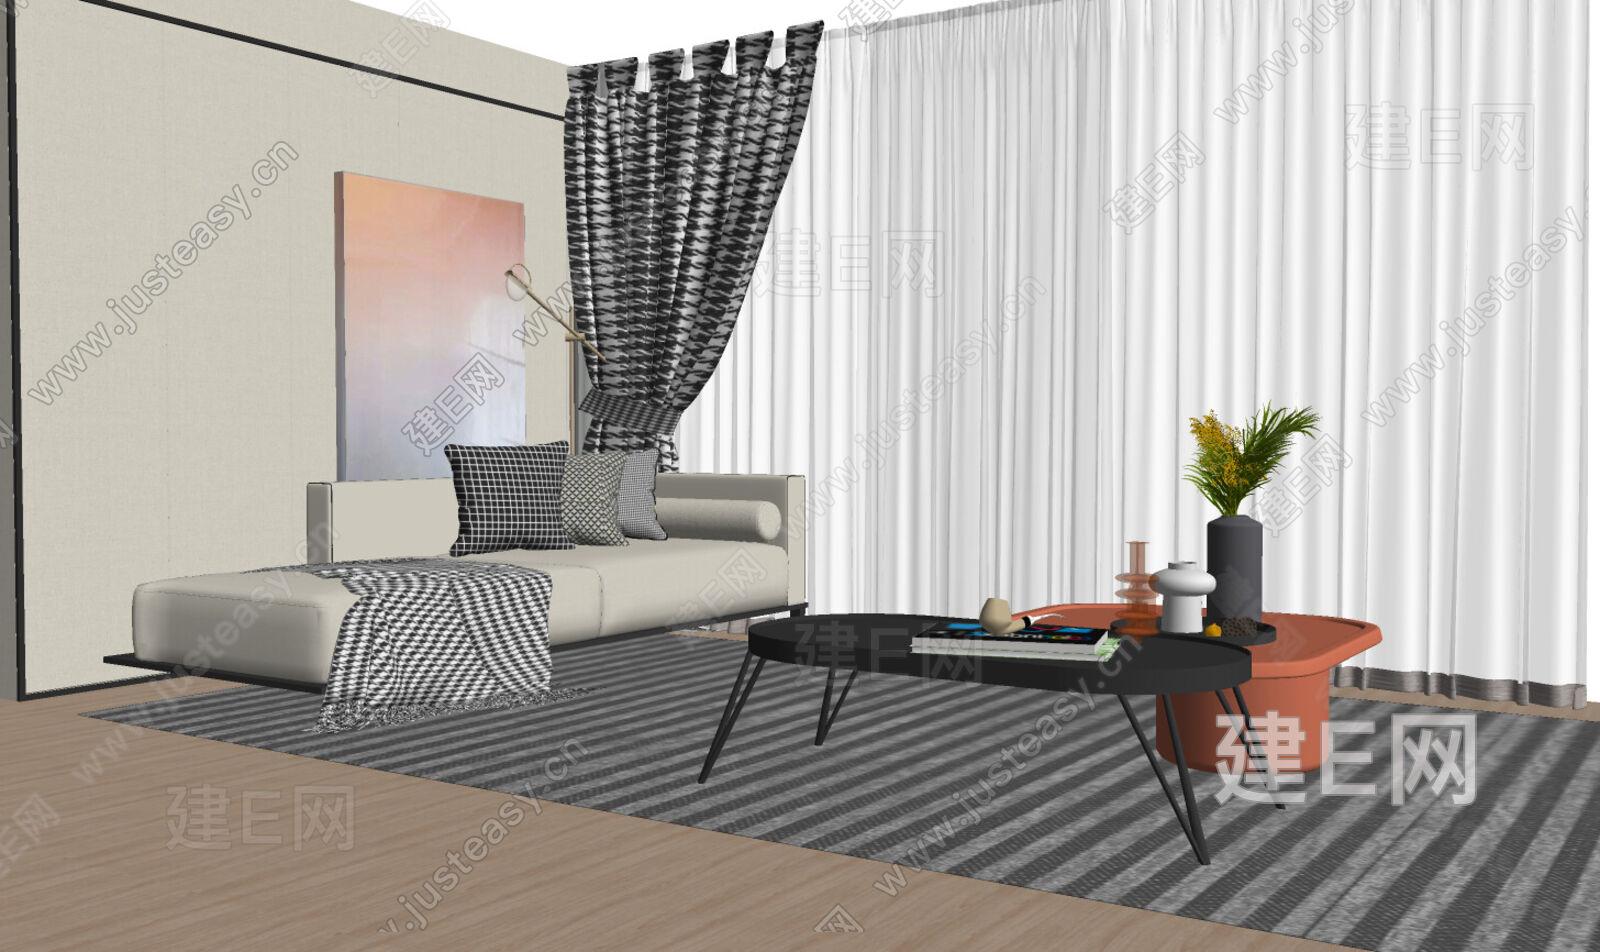 现代沙发组合sketchup模型